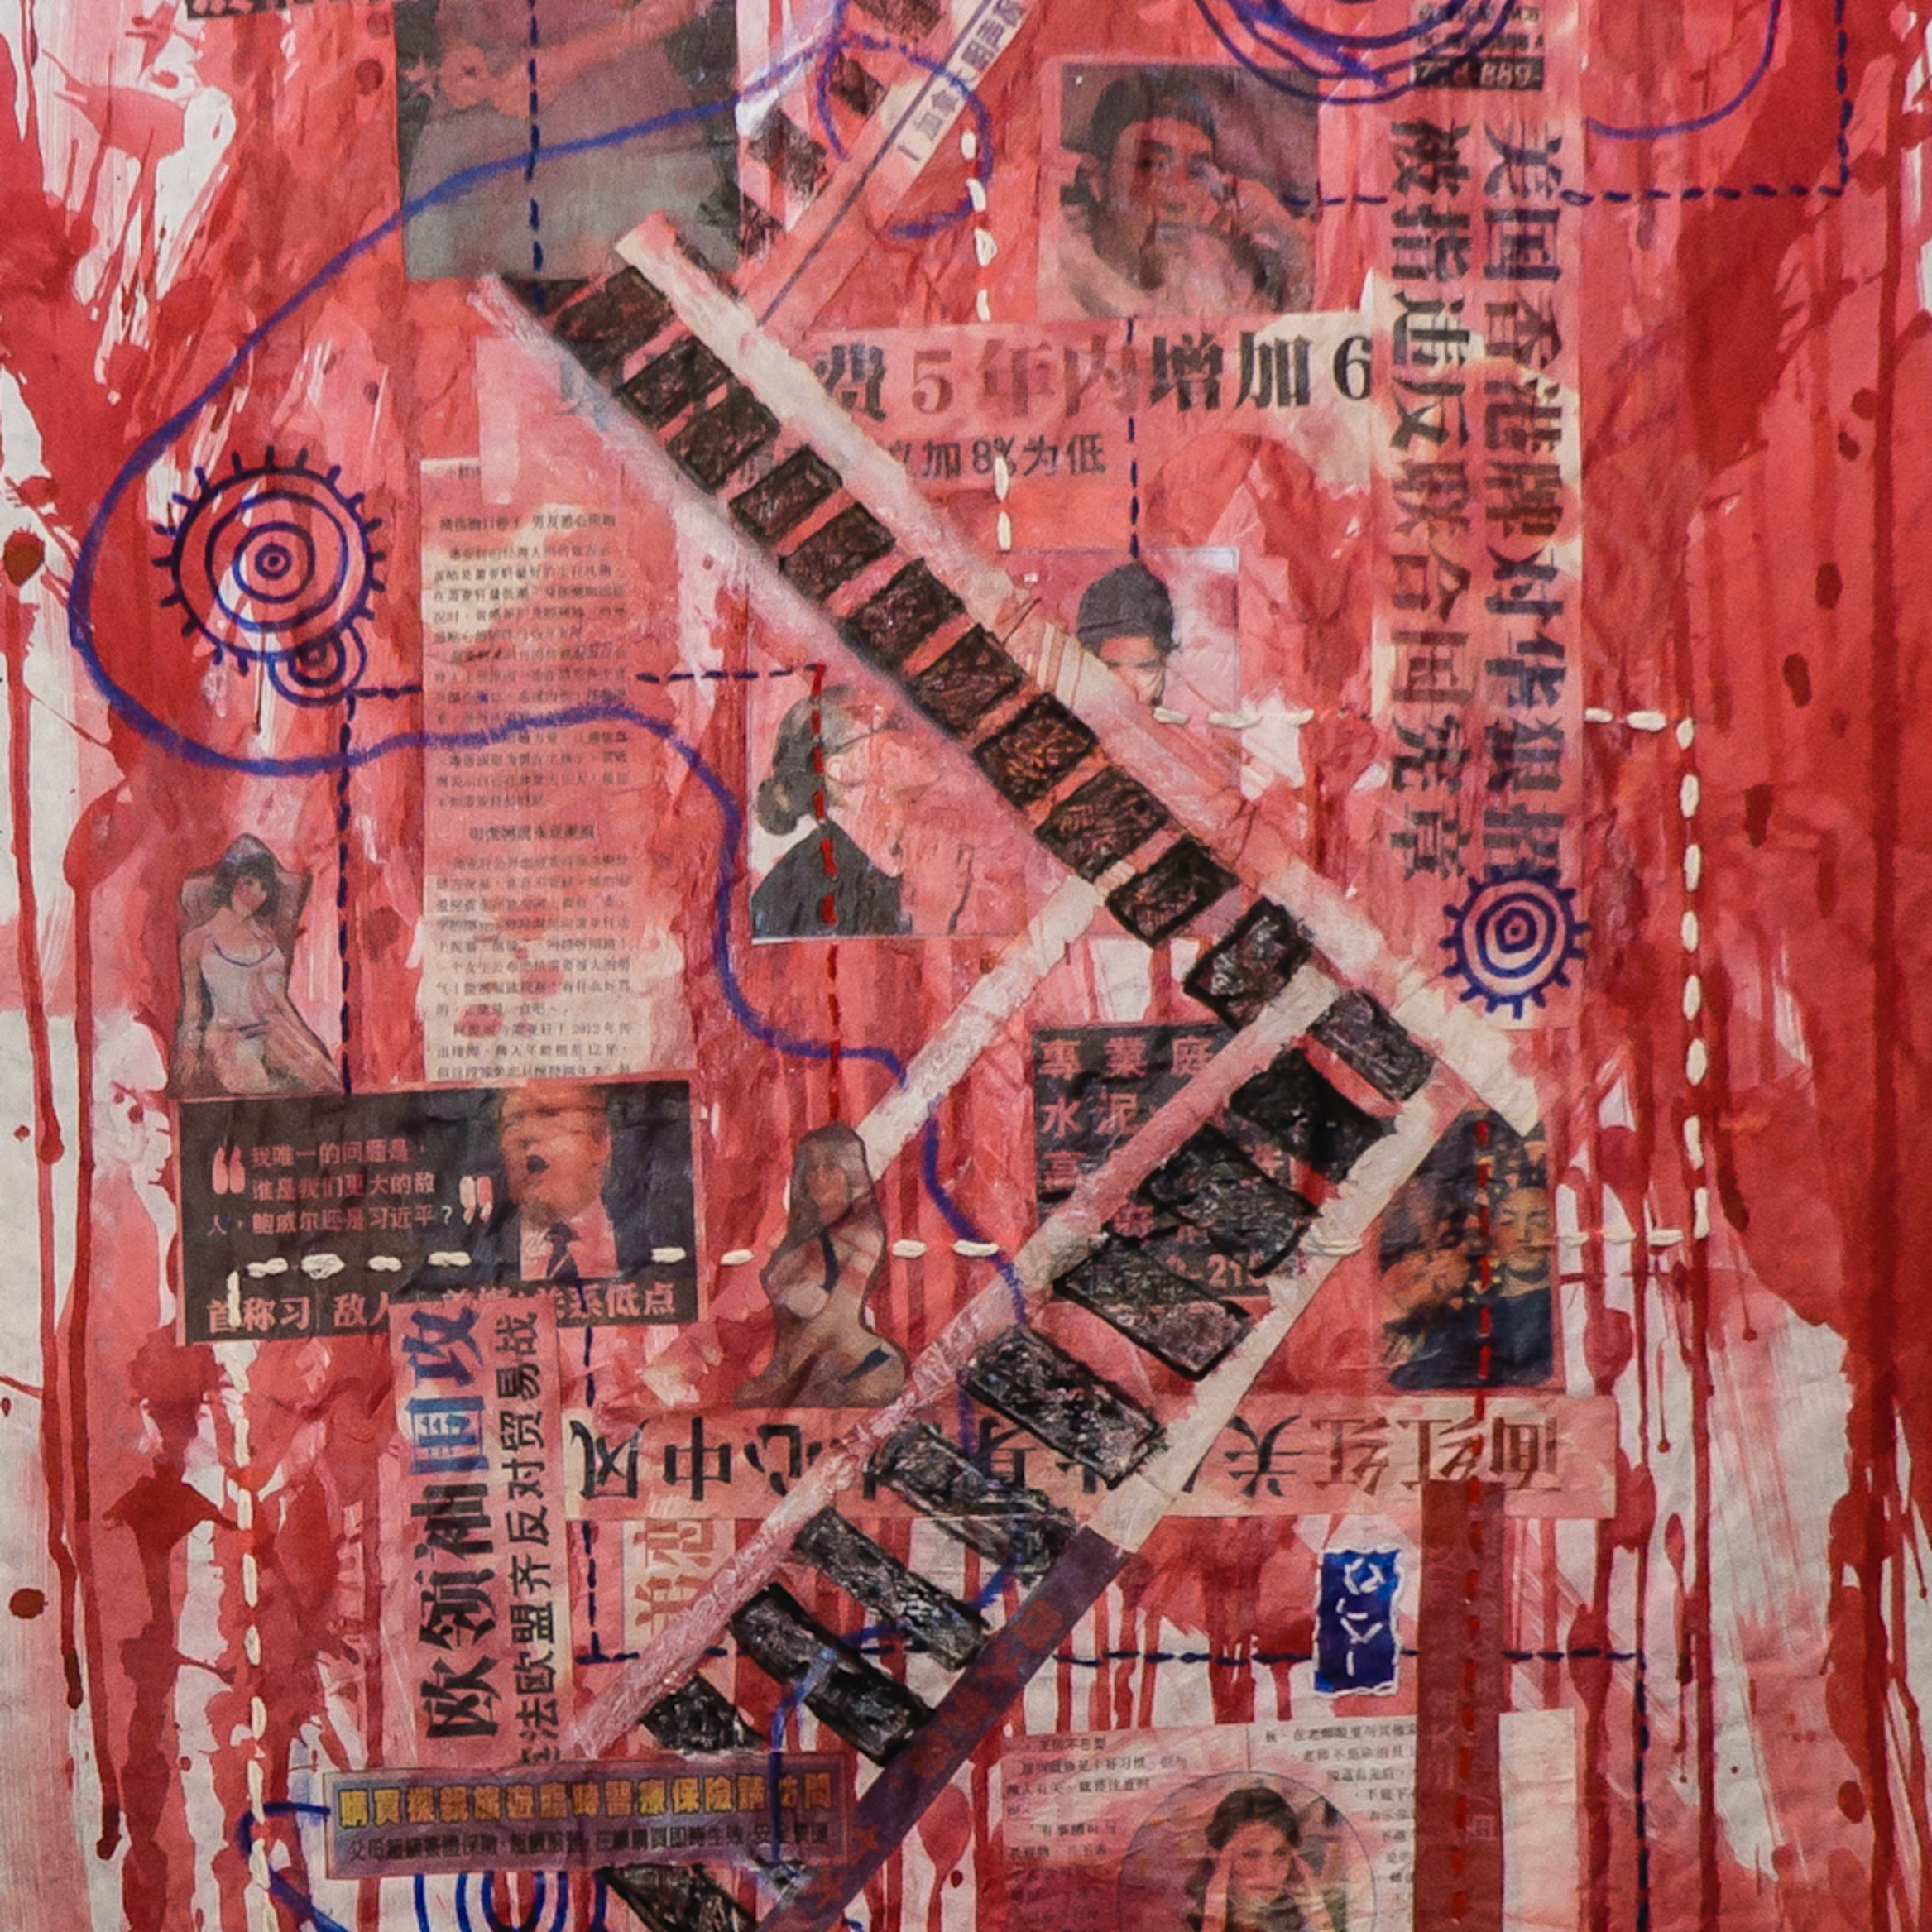 Muffy clark gill bleeding love  mixed media 38 x 18 in ctjaym